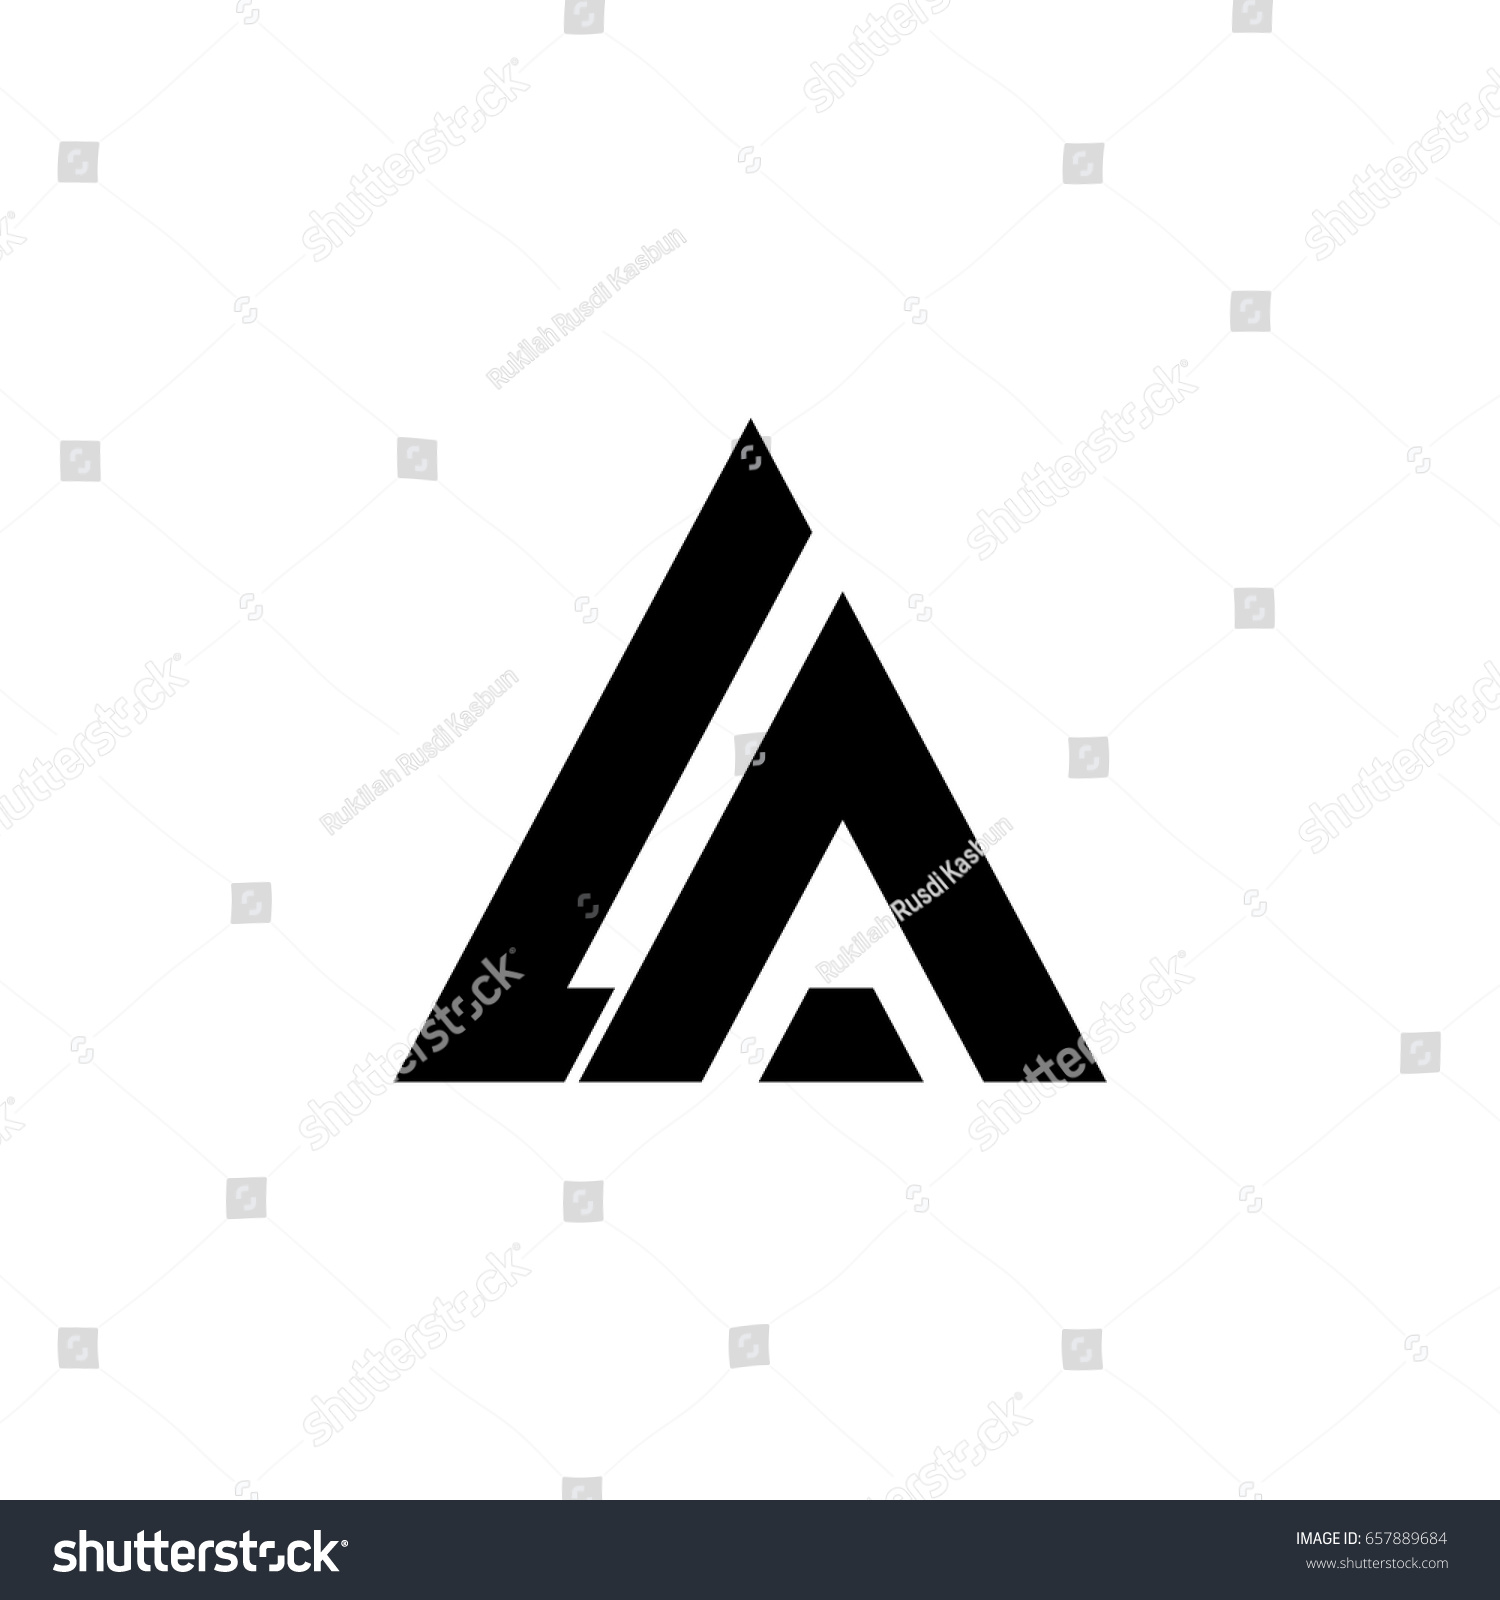 letter logo la letter logo stock vector royalty free 657889684